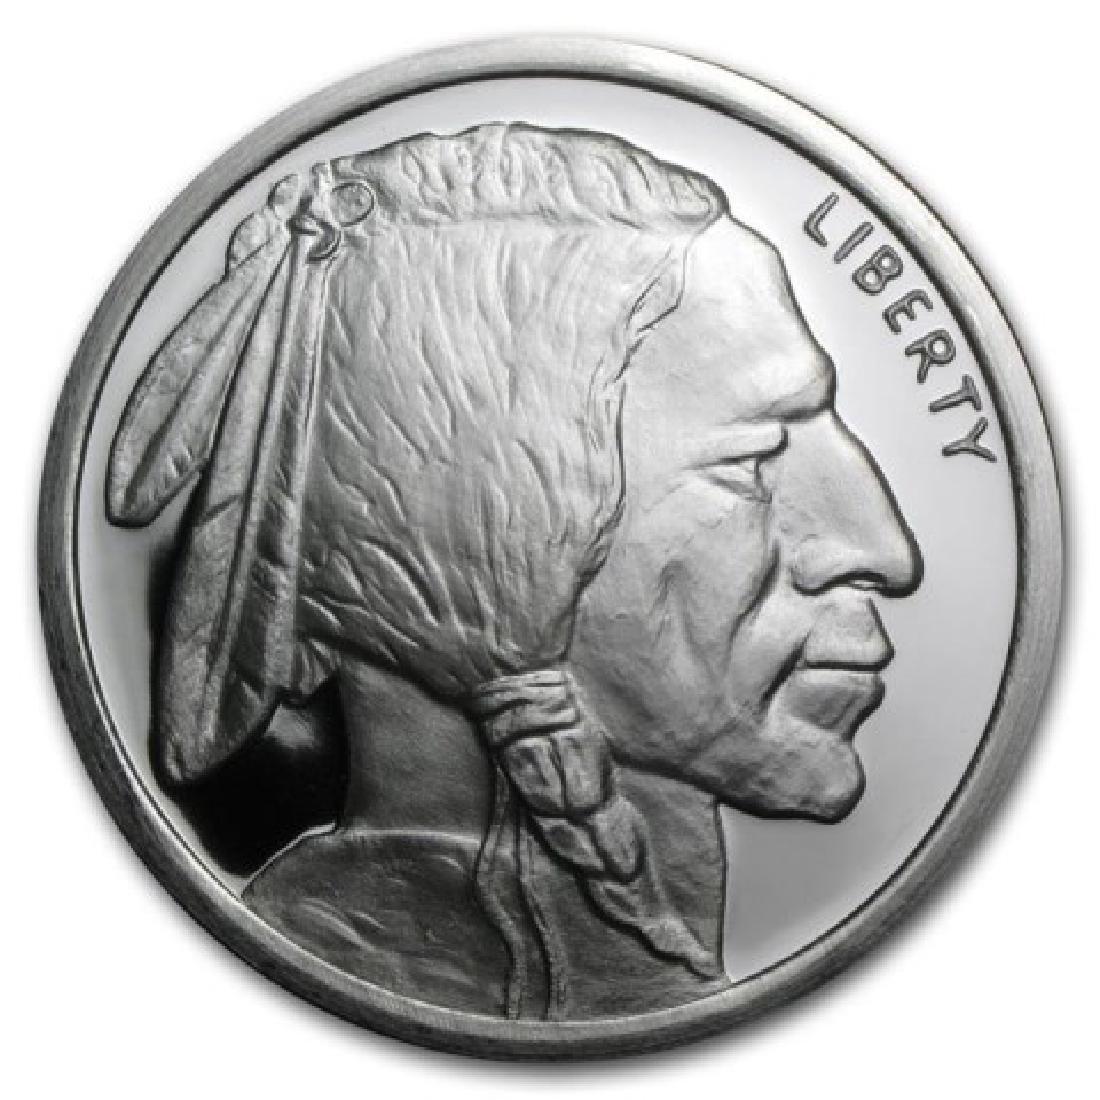 (10) Buffalo Design 1 oz. Silver Rounds .999 Pure - 2